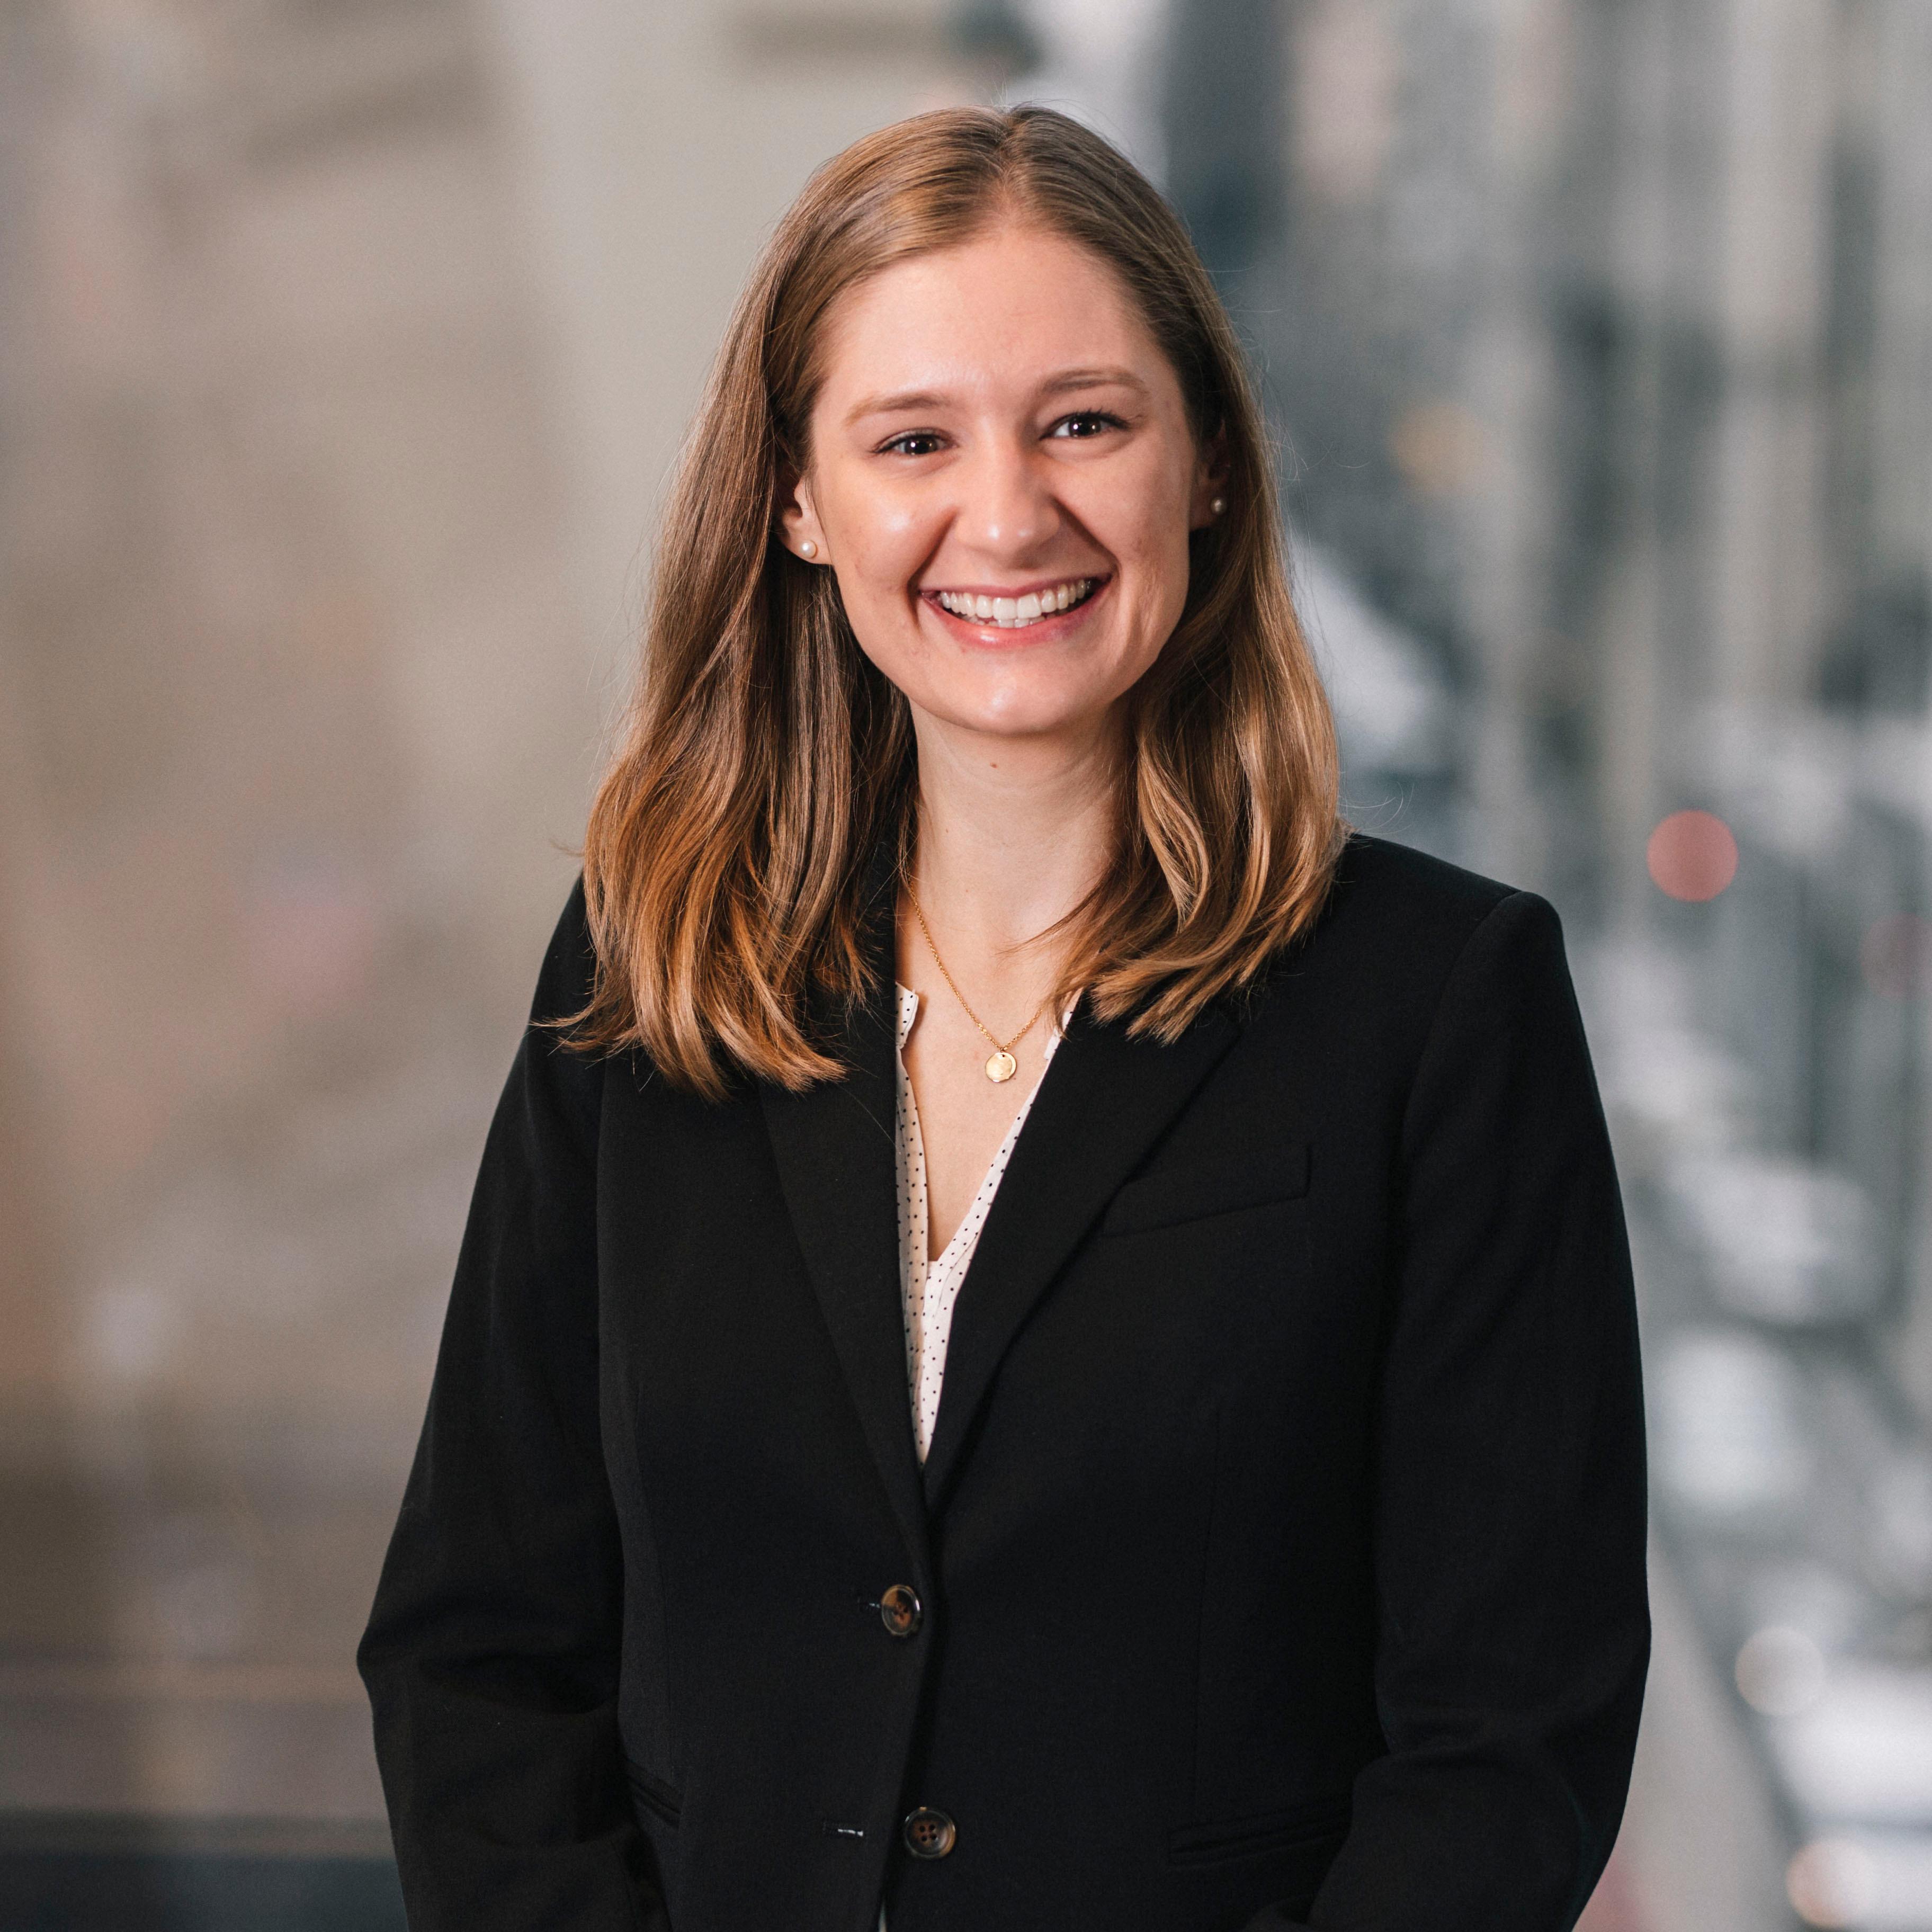 Samantha Leveugle - Director of Marketing